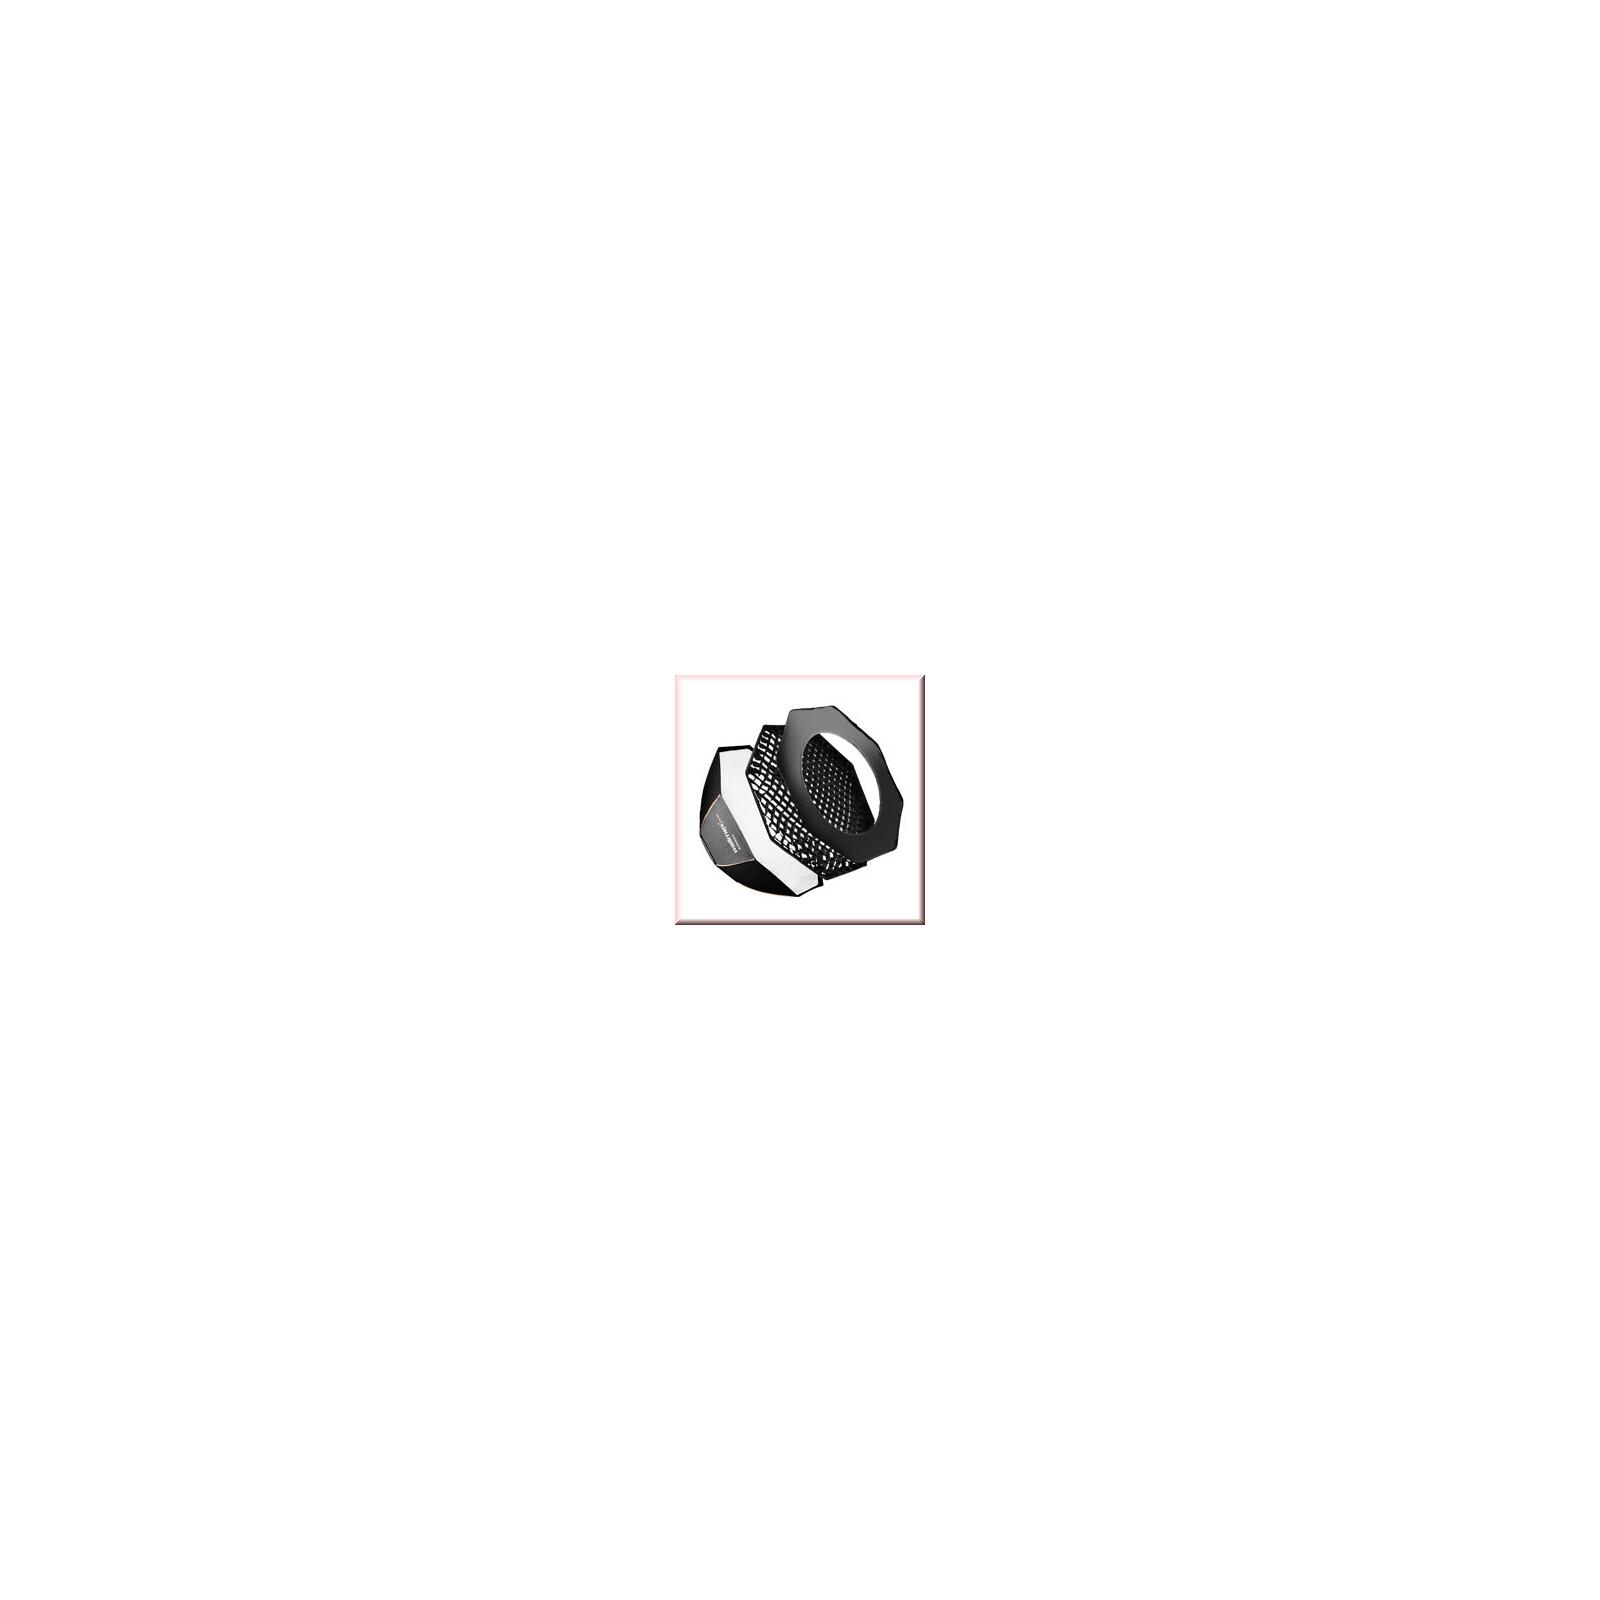 walimex pro Octagon Softbox PLUS OL Ø90 Balcar